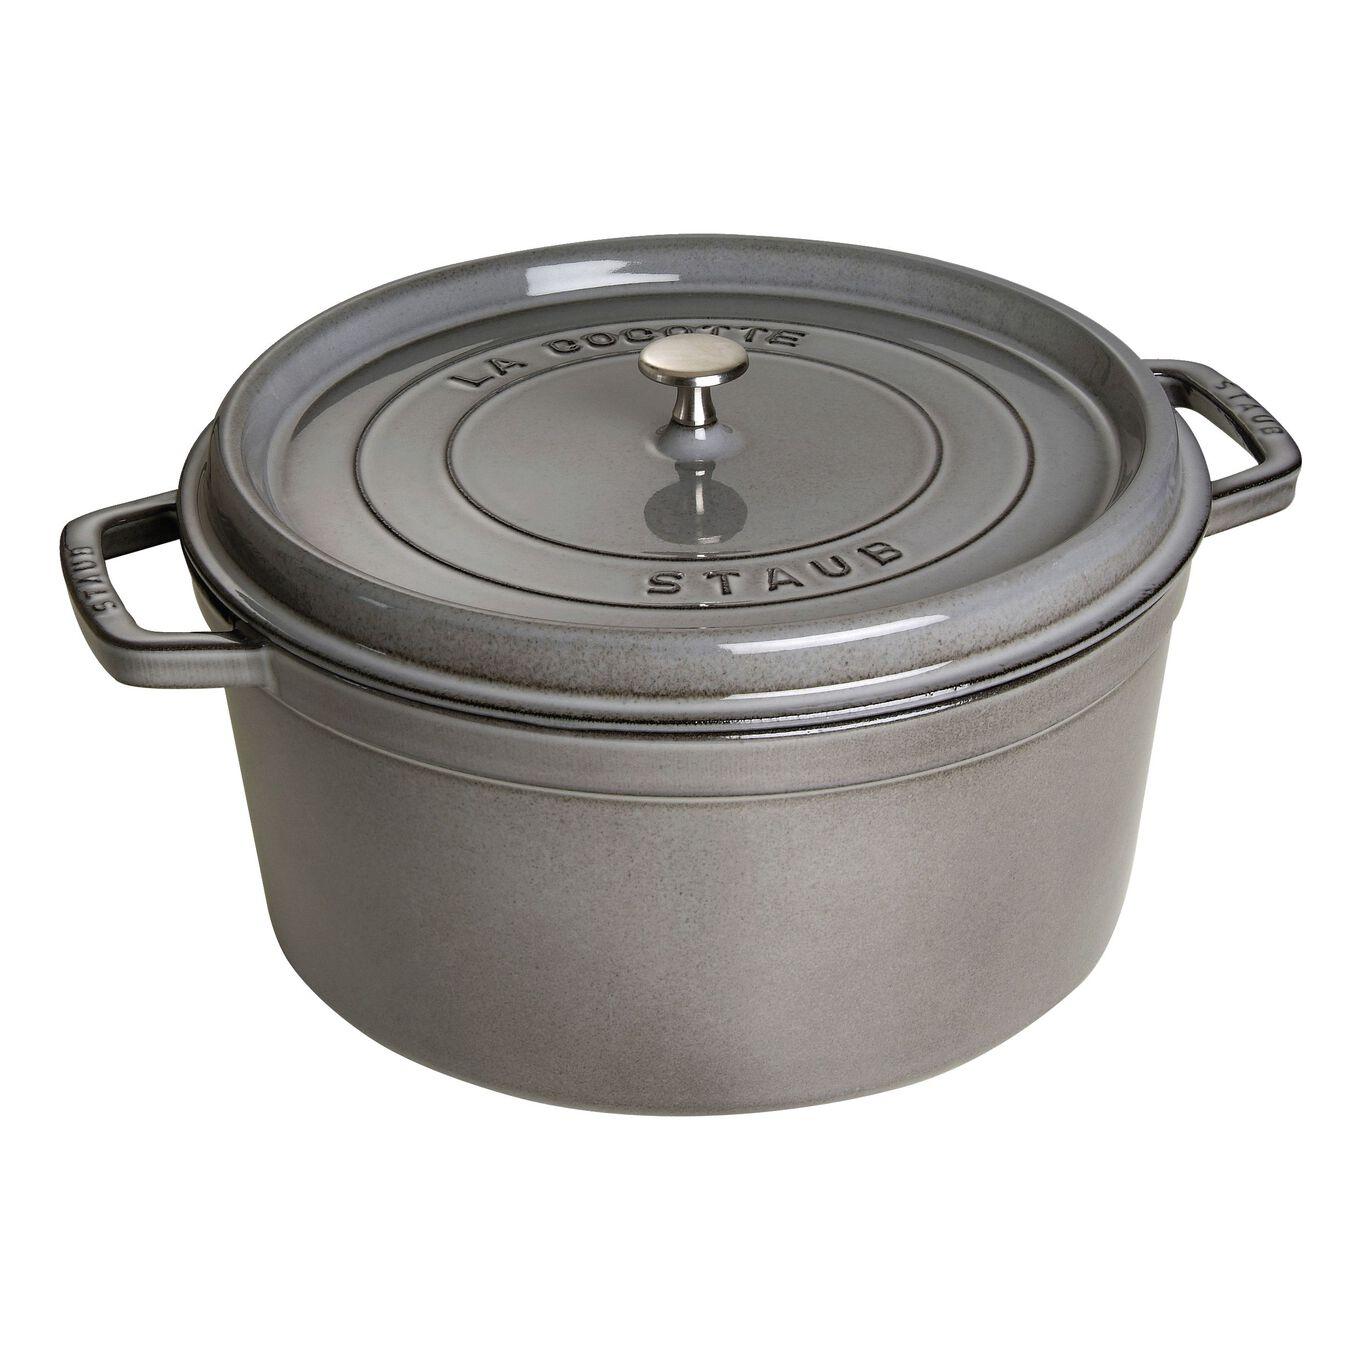 12.5 l Cast iron round Cocotte, Graphite-Grey,,large 1